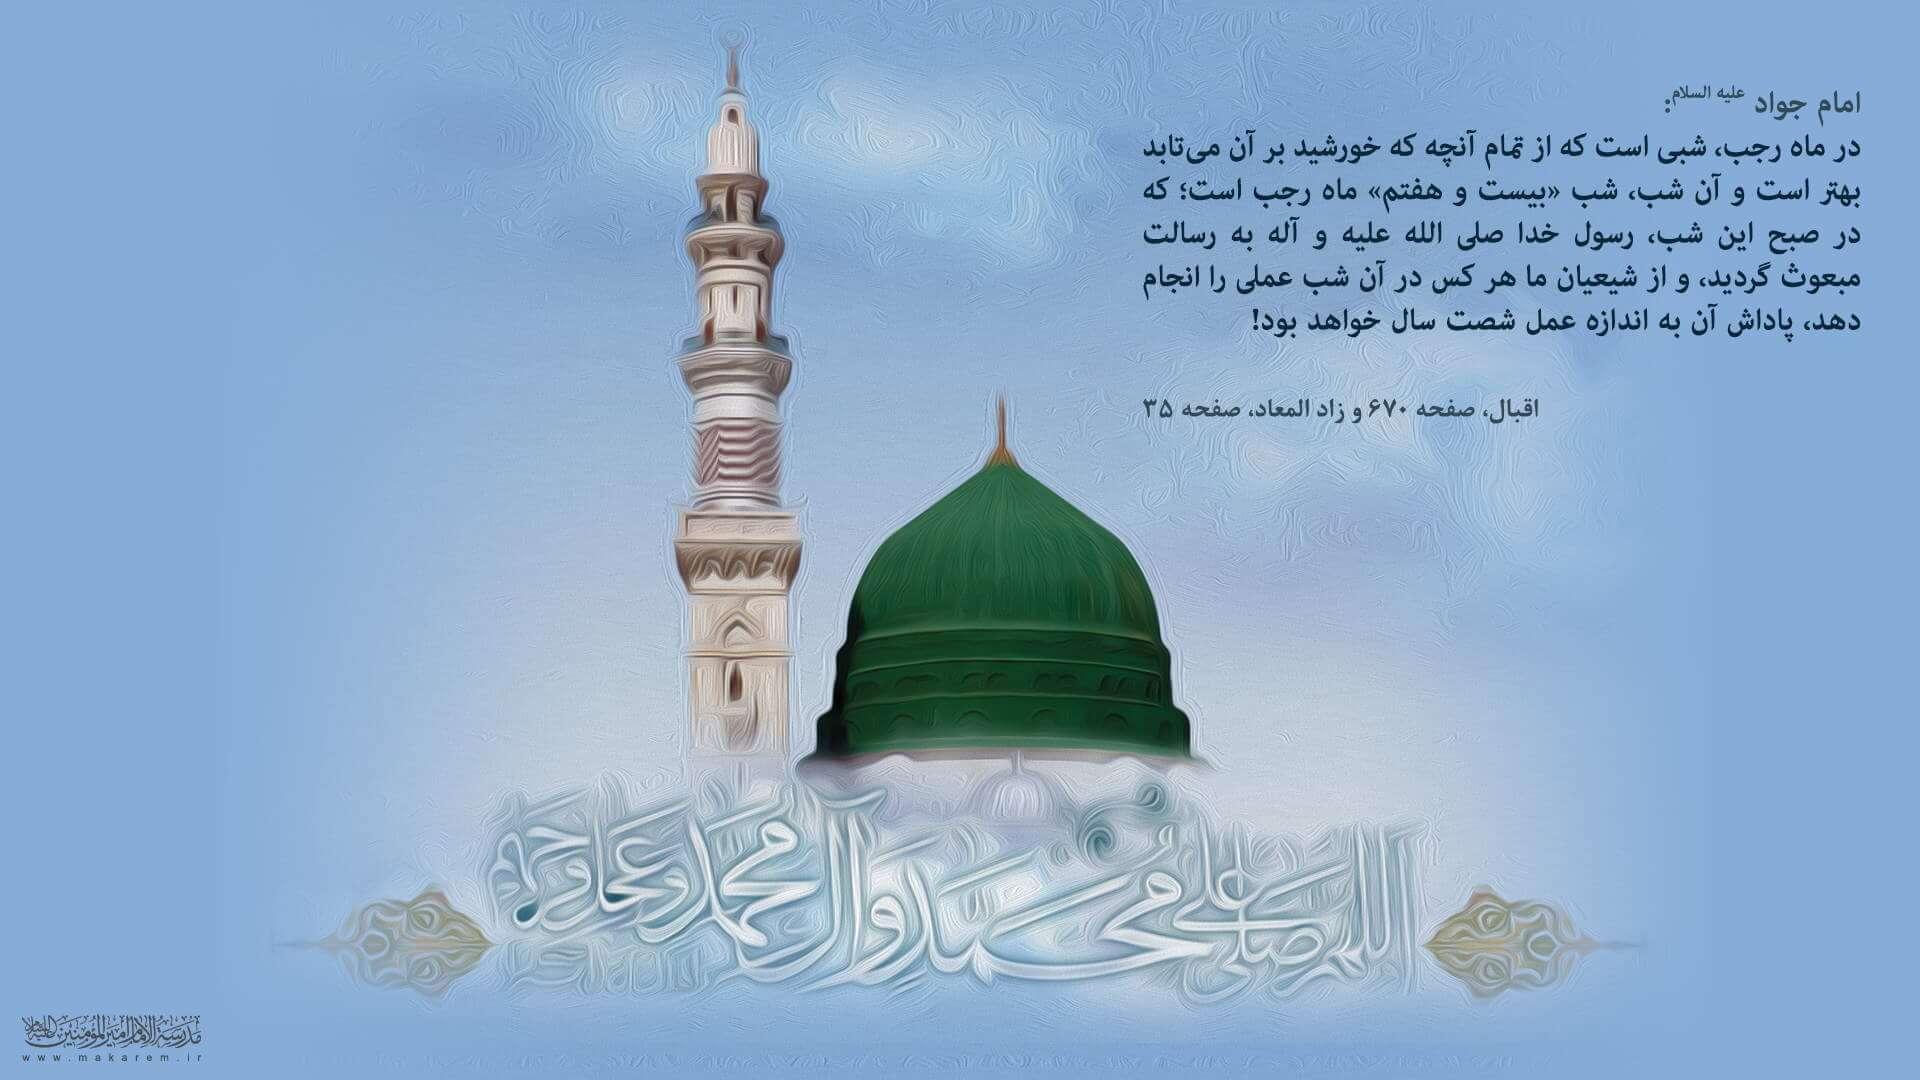 مبعث 03-مدرسه الامام امیر المومنین (ع)